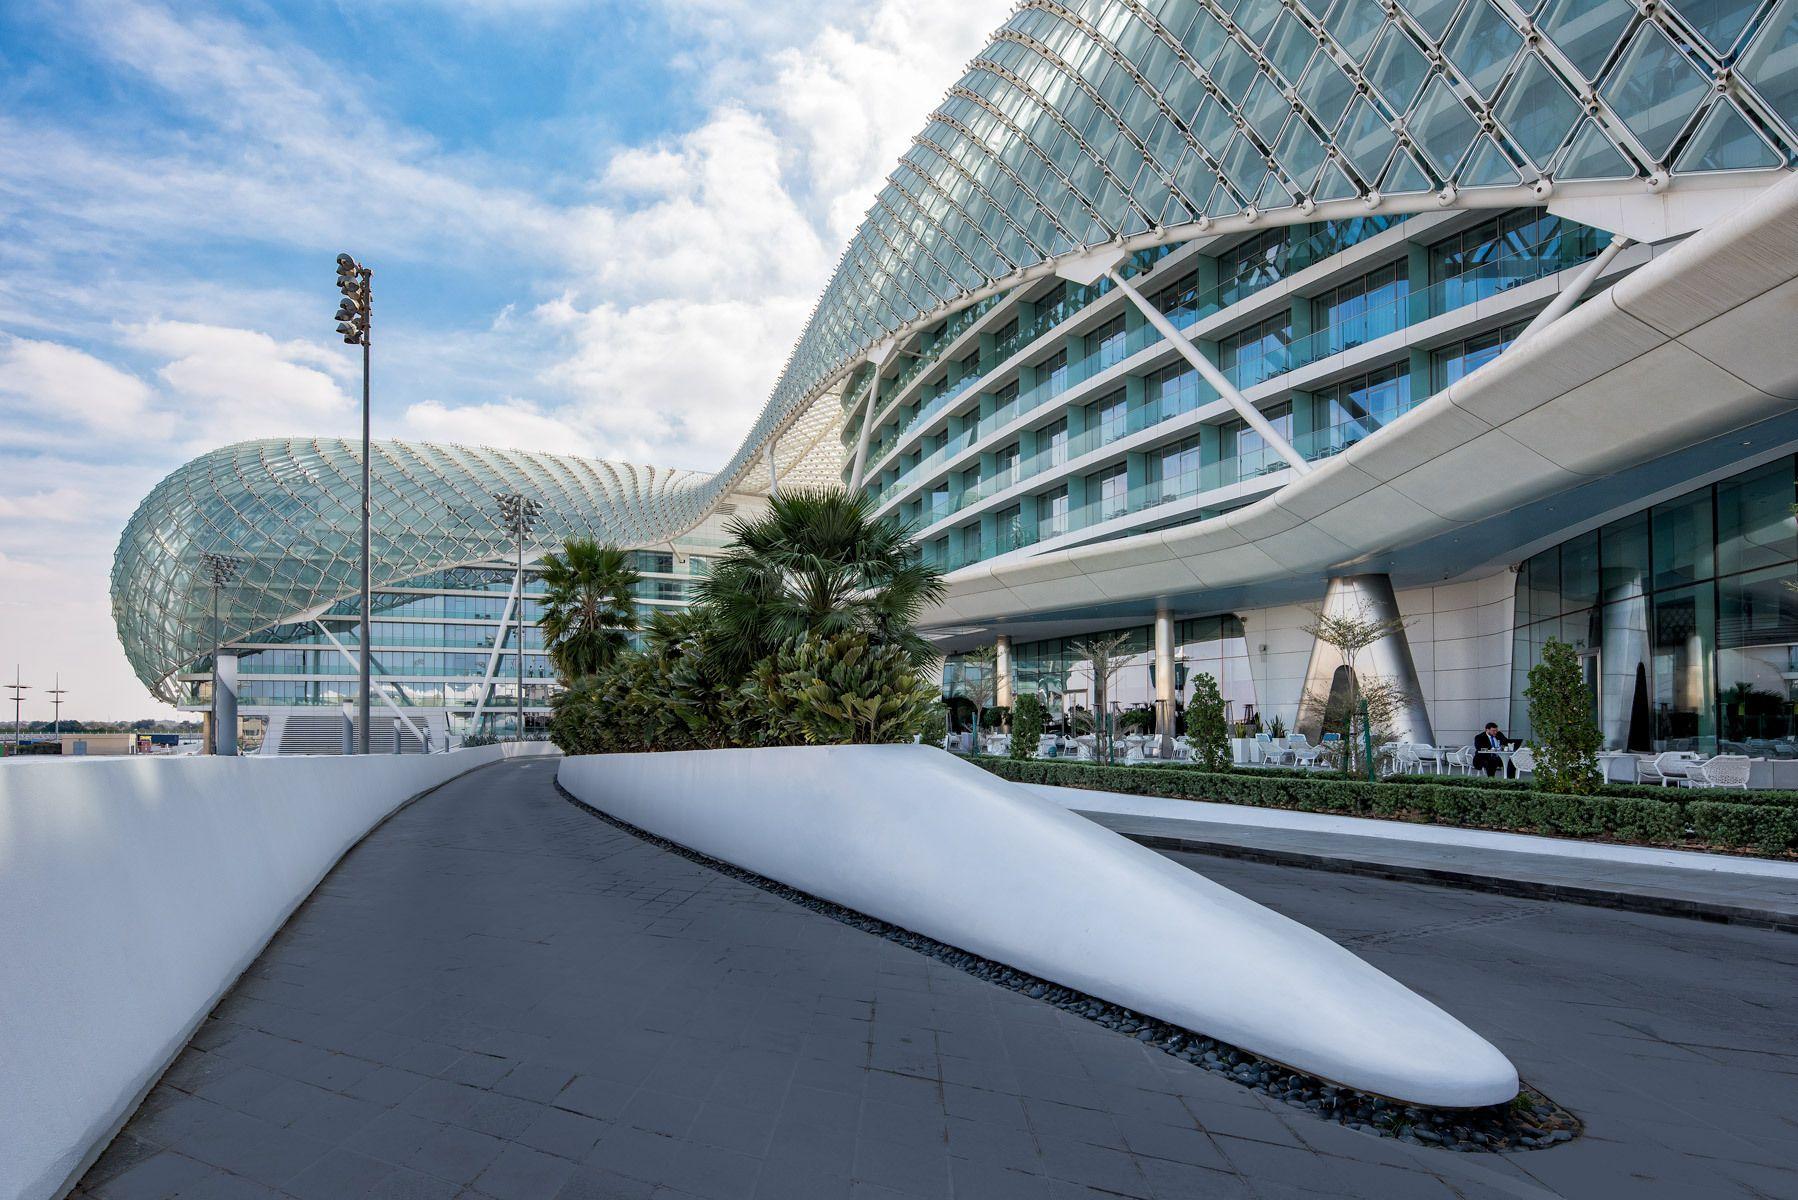 Viceroy Hotel, Abu Dhabi, UAE